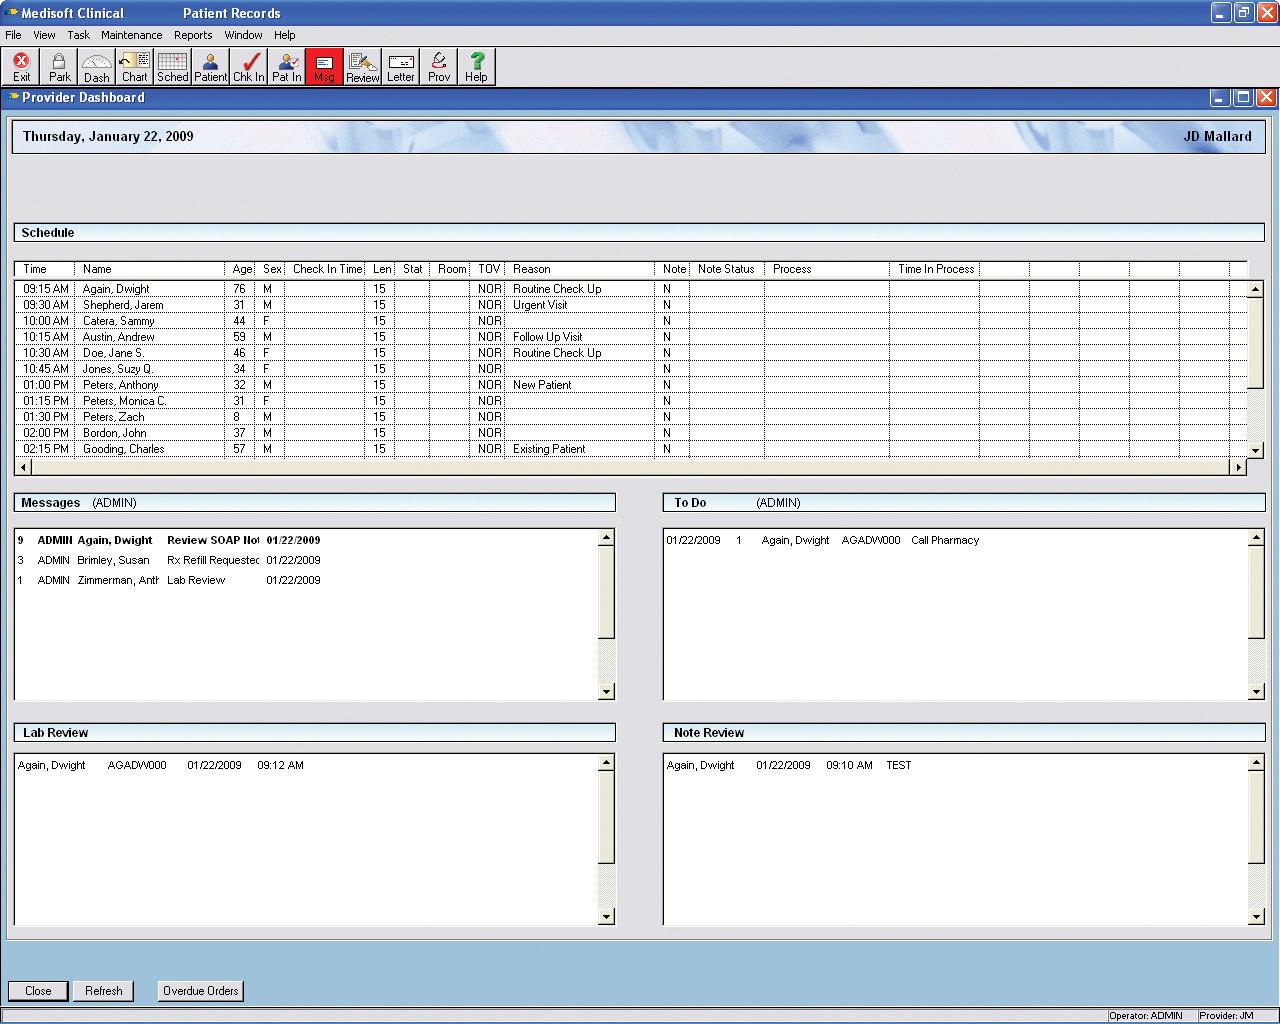 Medisoft Clinical Software - Provider dashboard